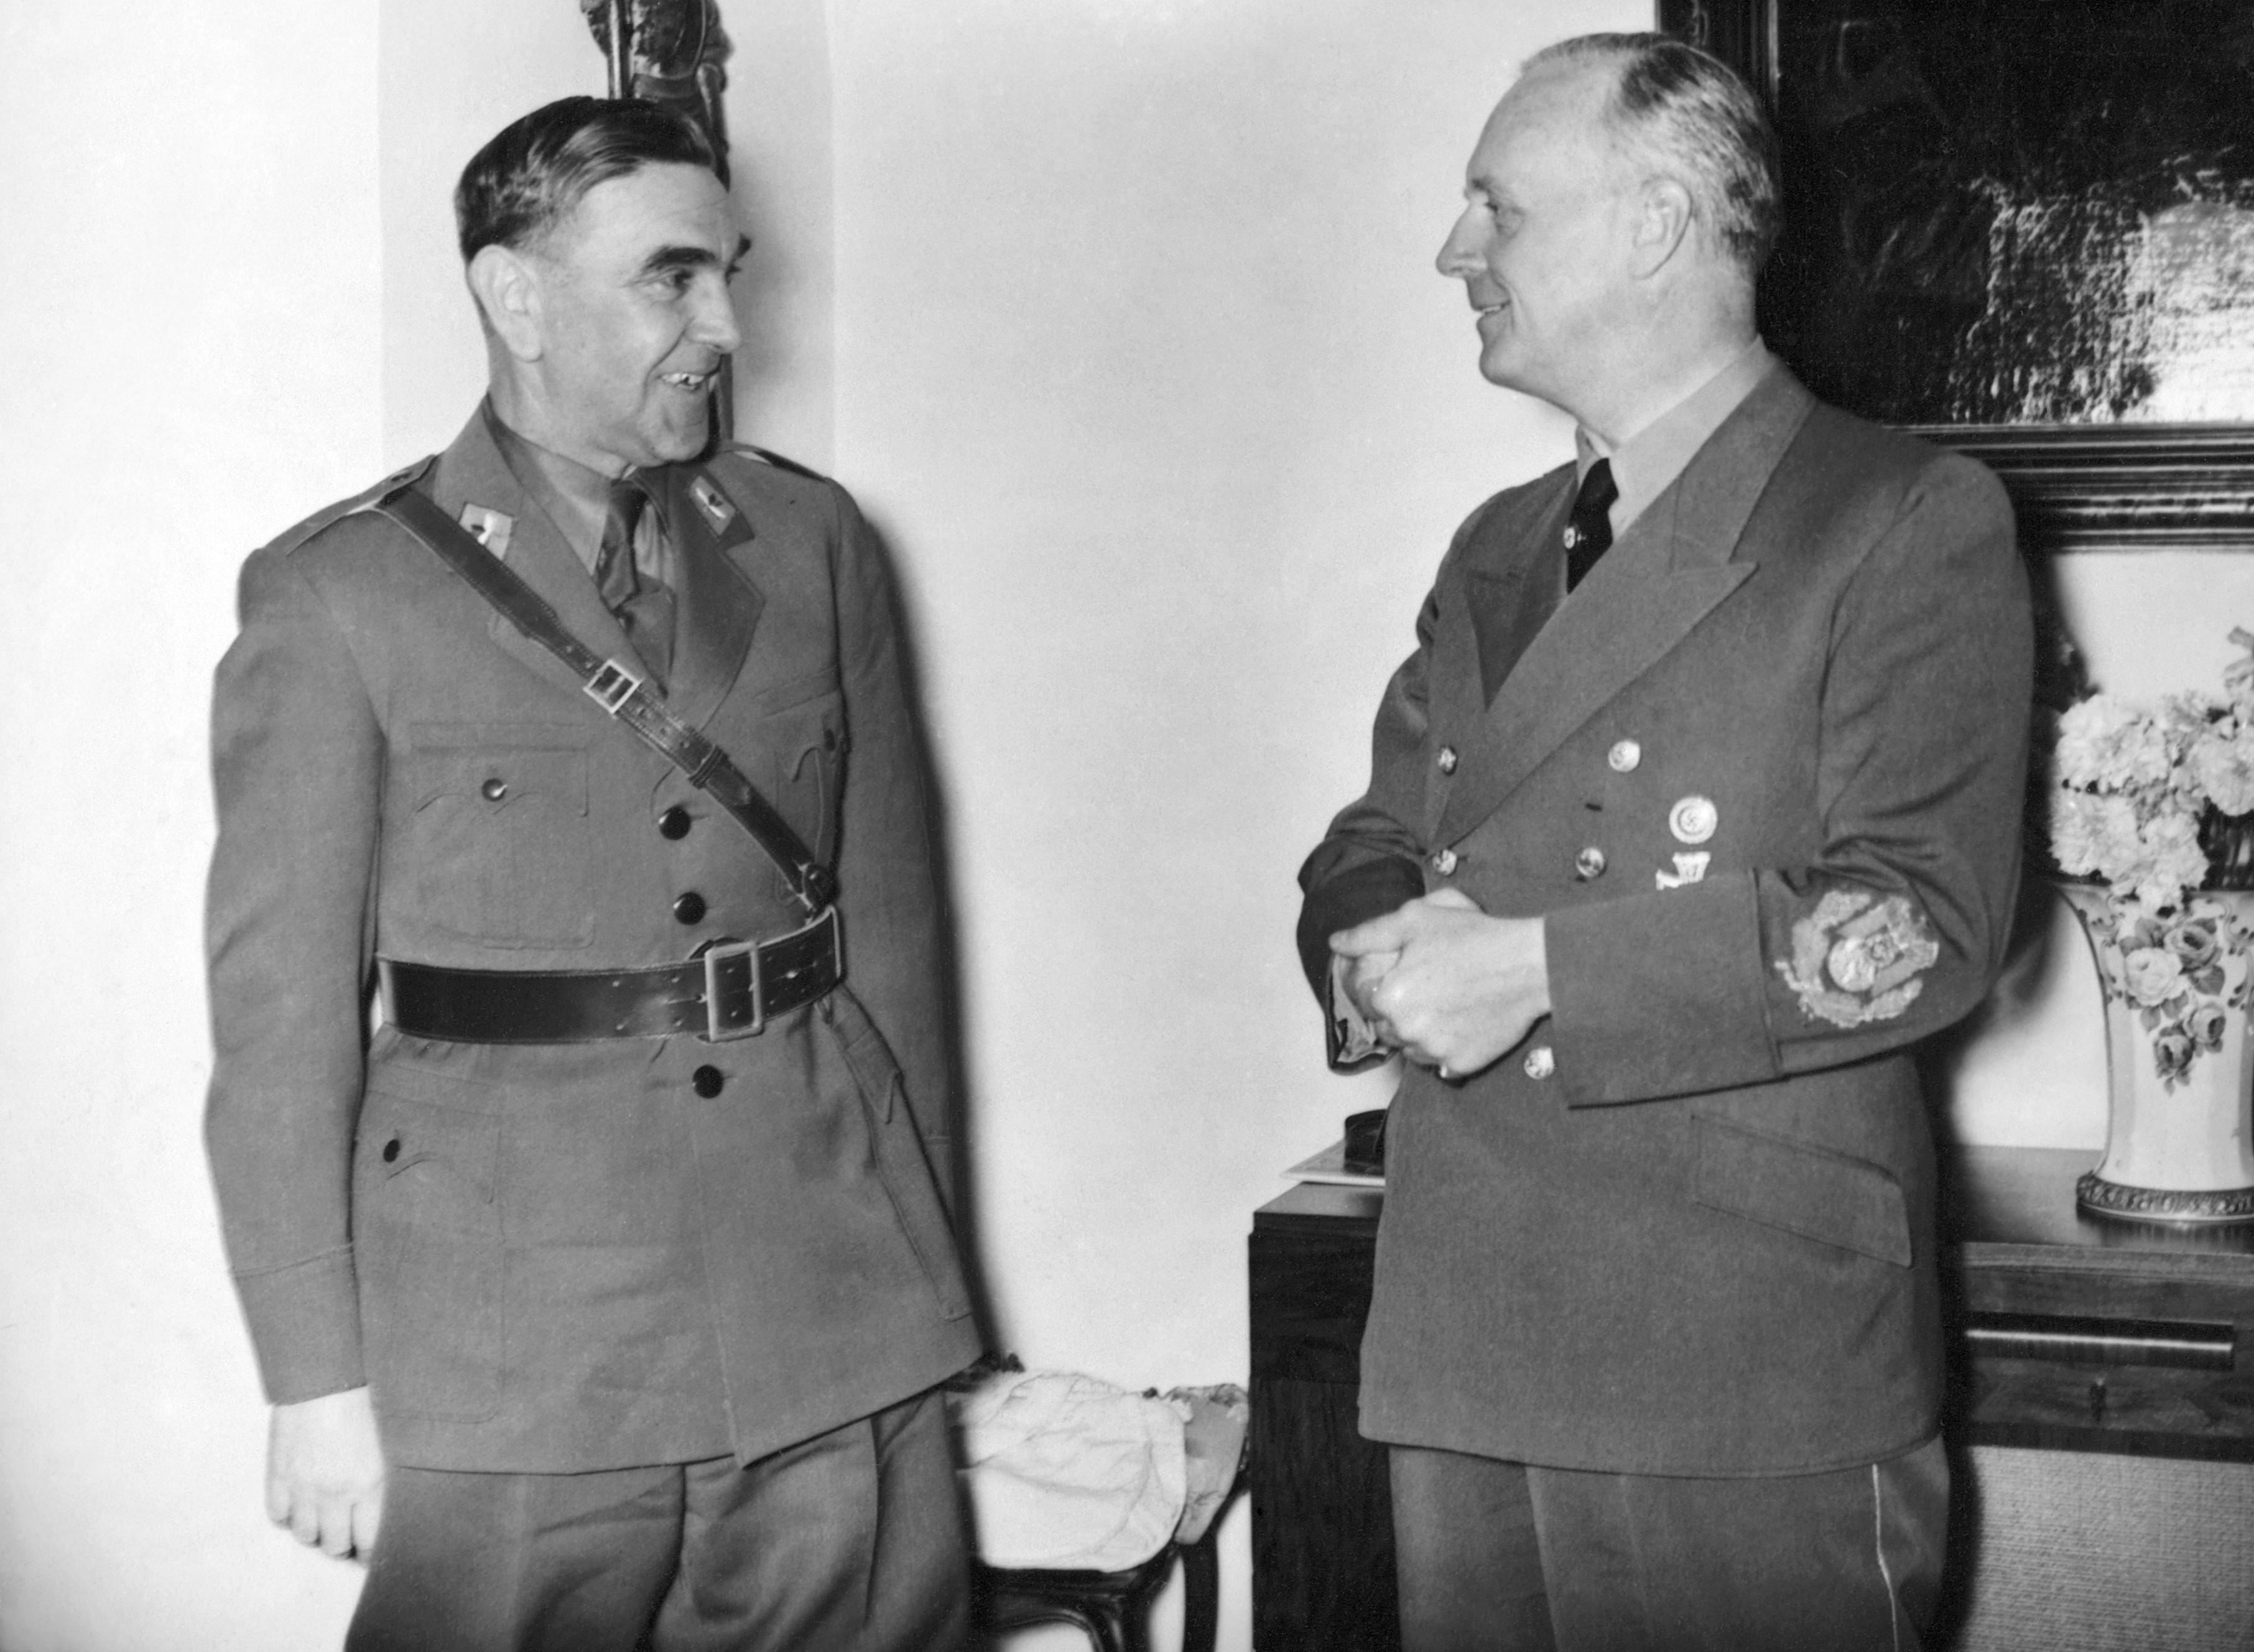 Ante Pavelic and Von Ribbentrop